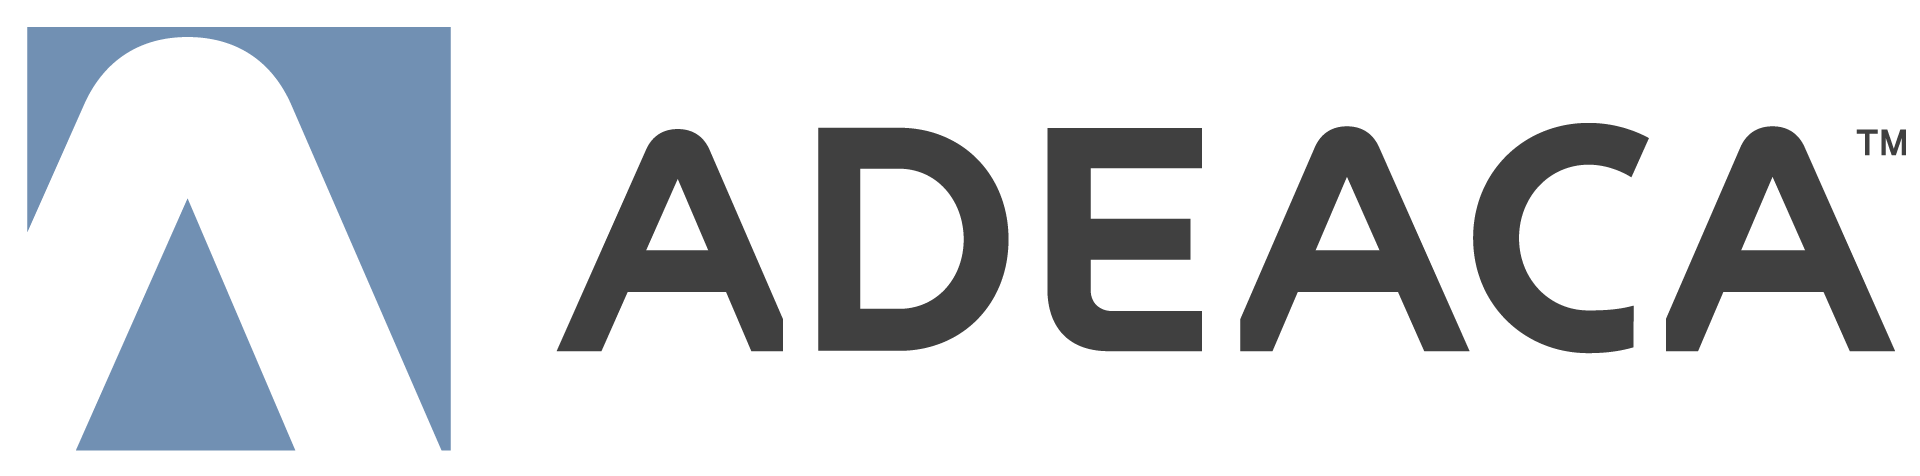 Matt Mong of Adeaca Talks Project Modeling in Manufacturing Tomorrow